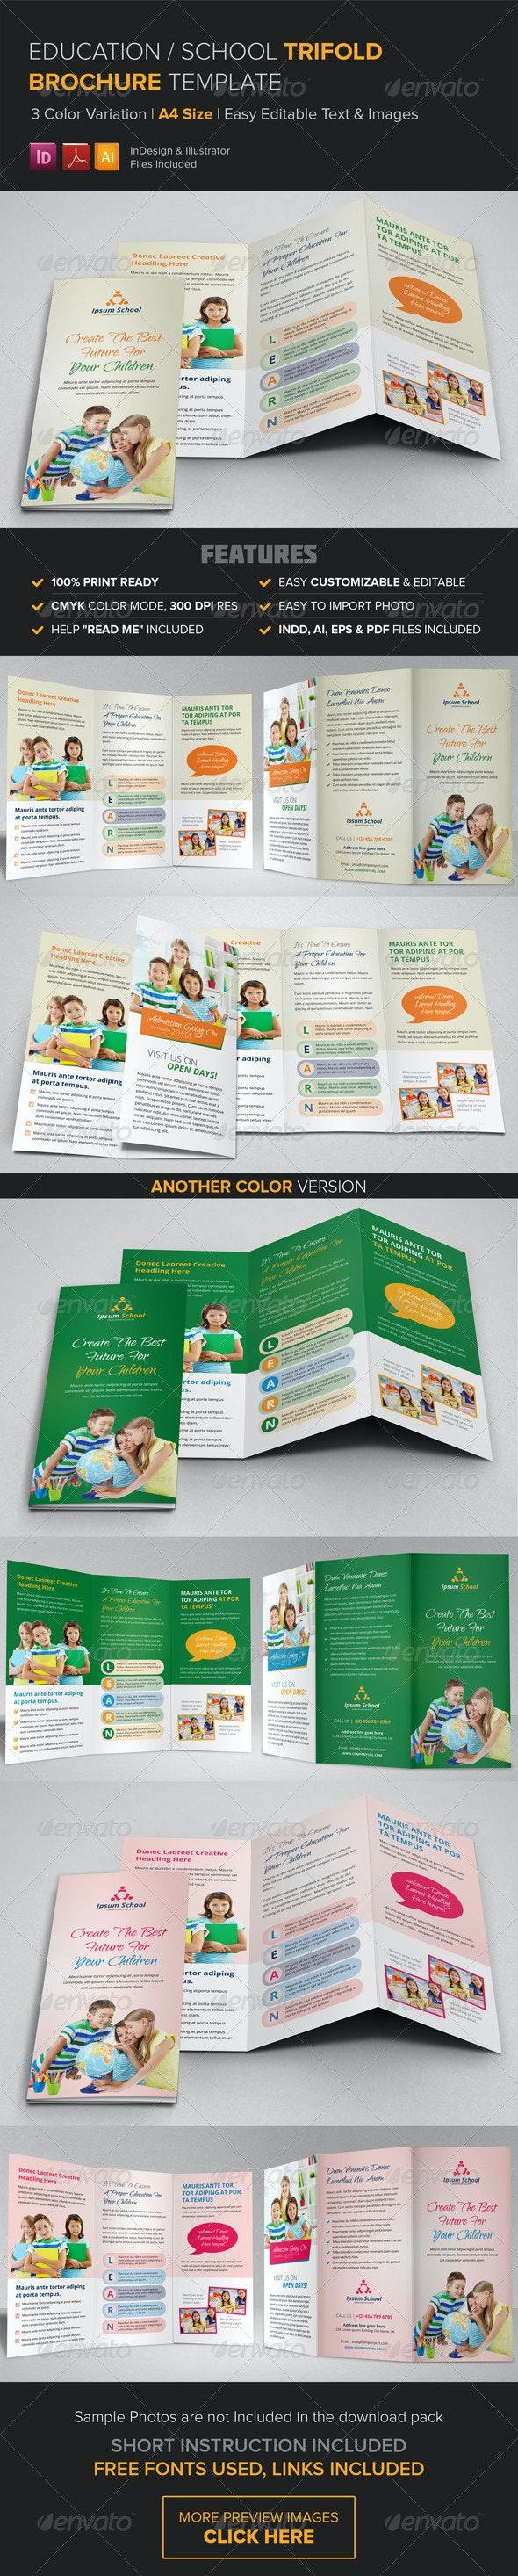 Education School Trifold Brochure Template - Corporate Brochures